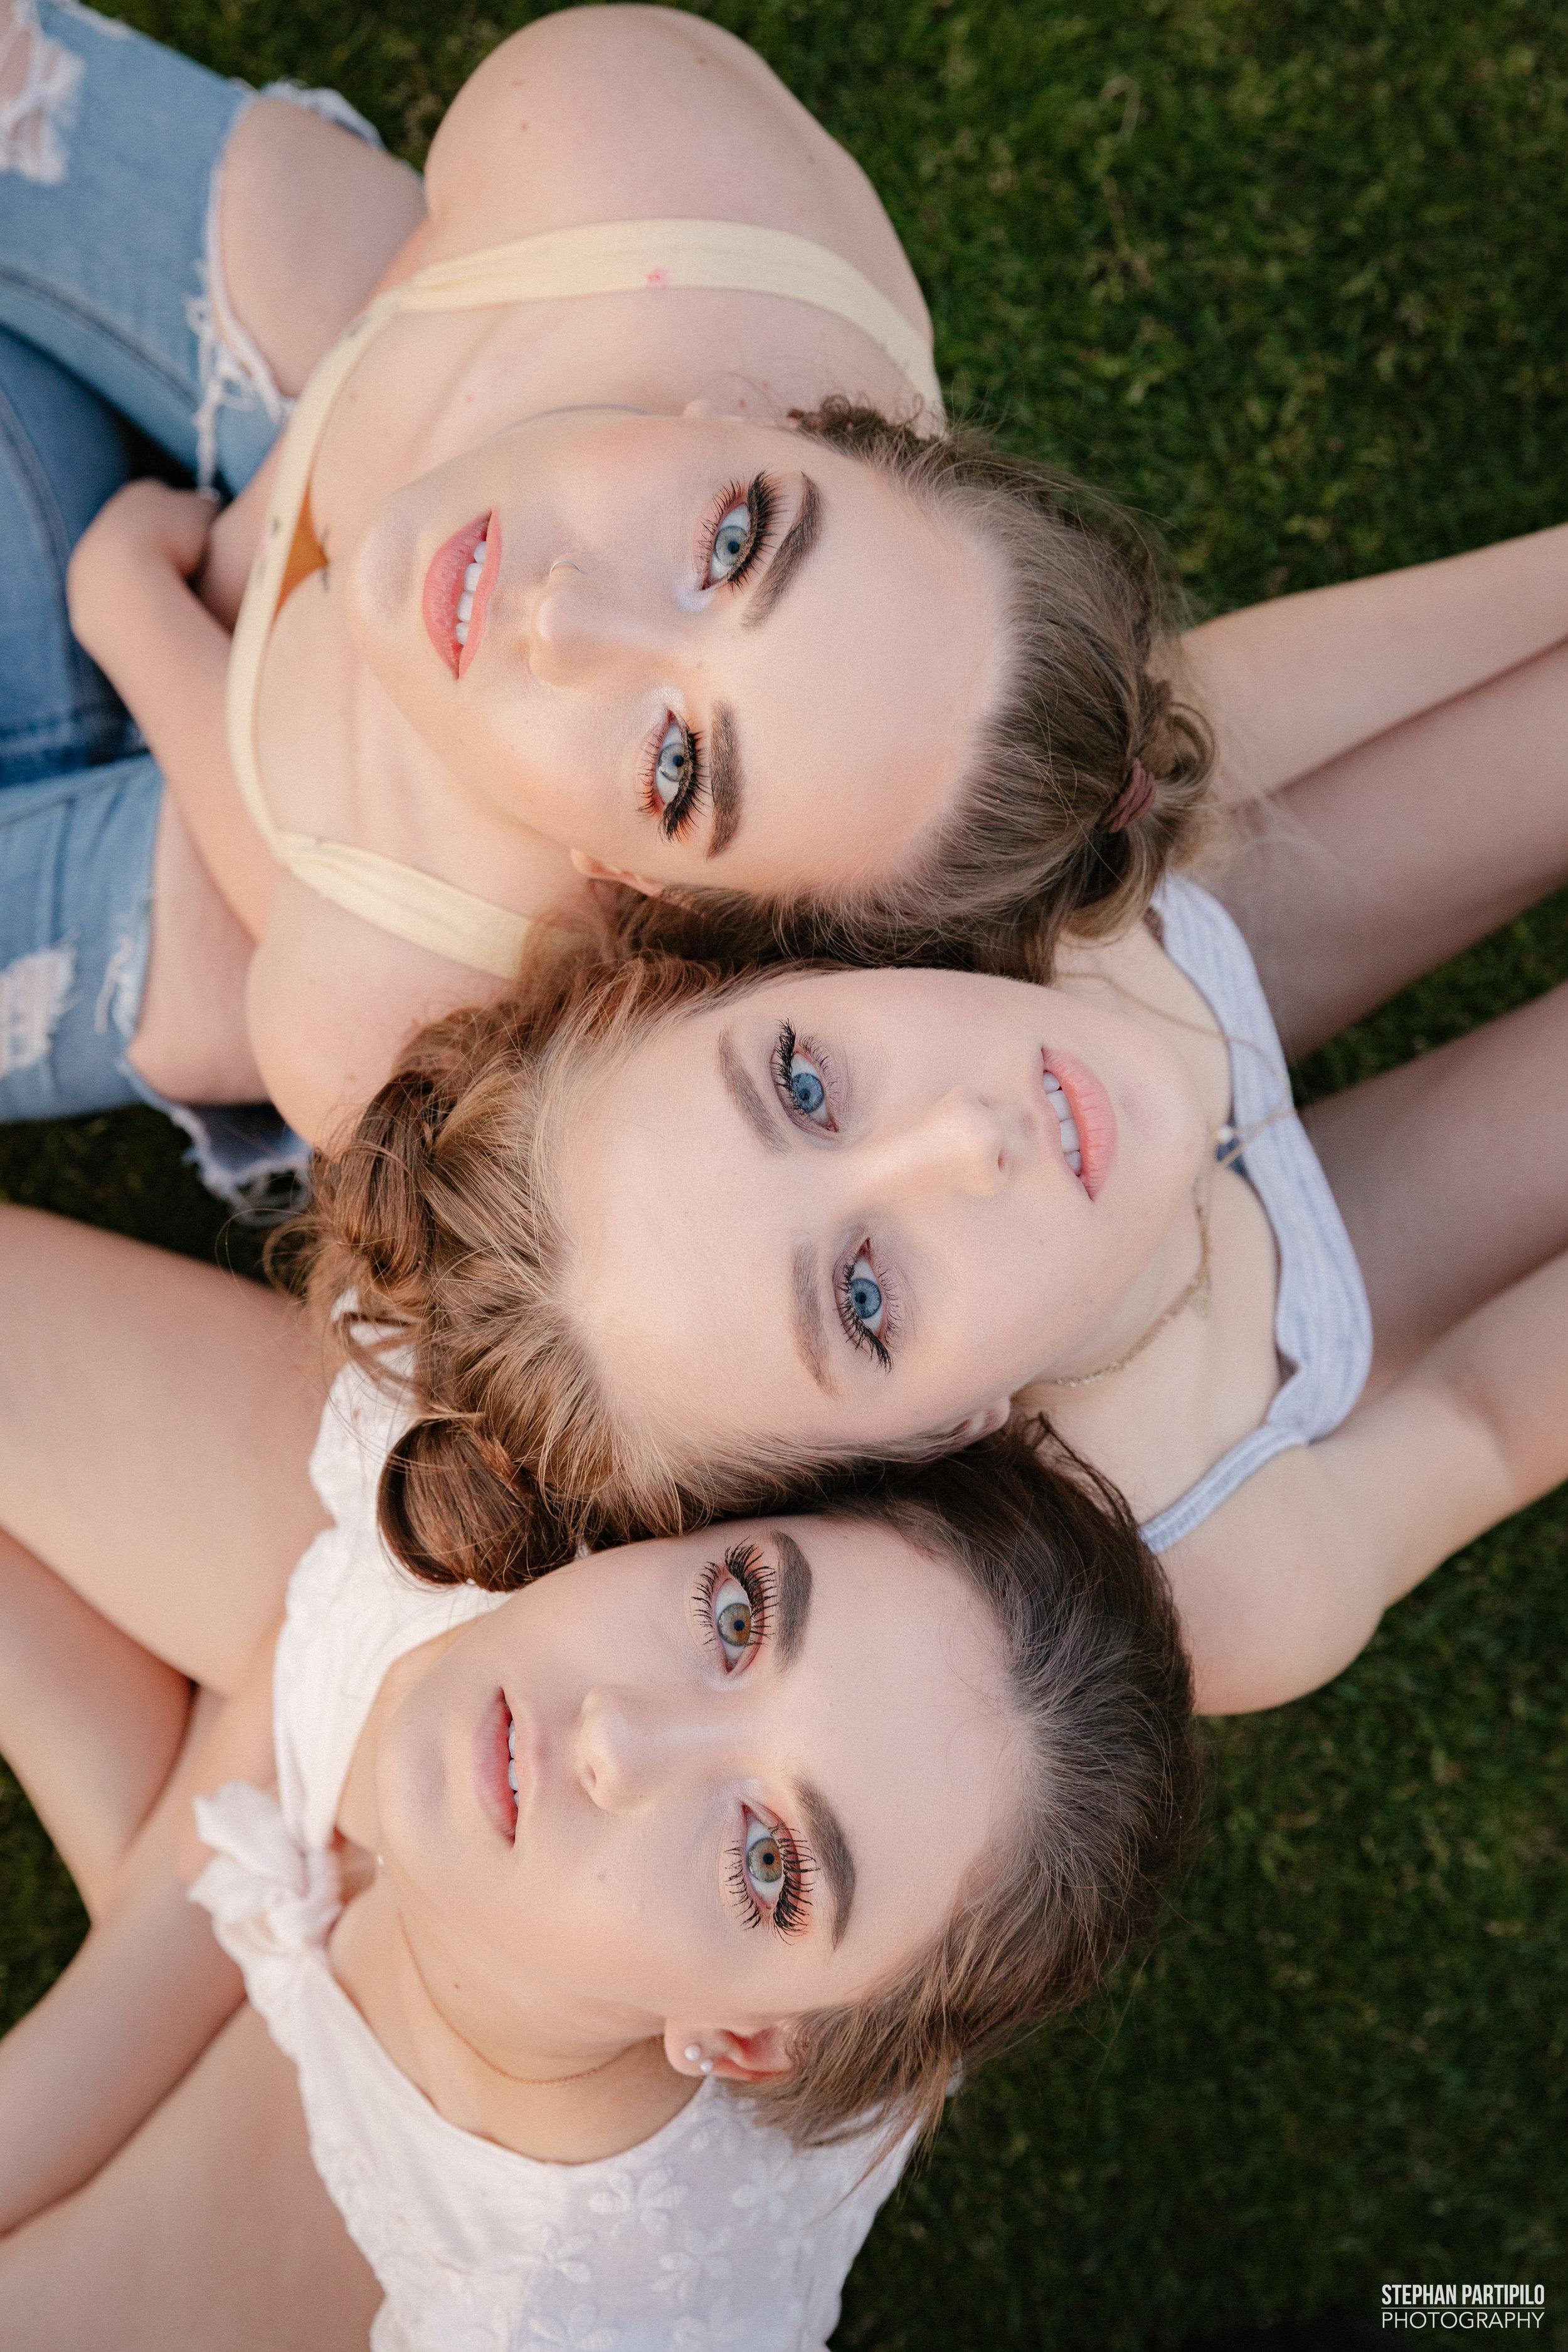 Kaitlynn Sarah Chloe Sisters July 2019 IG 10 0G5A8527.jpg